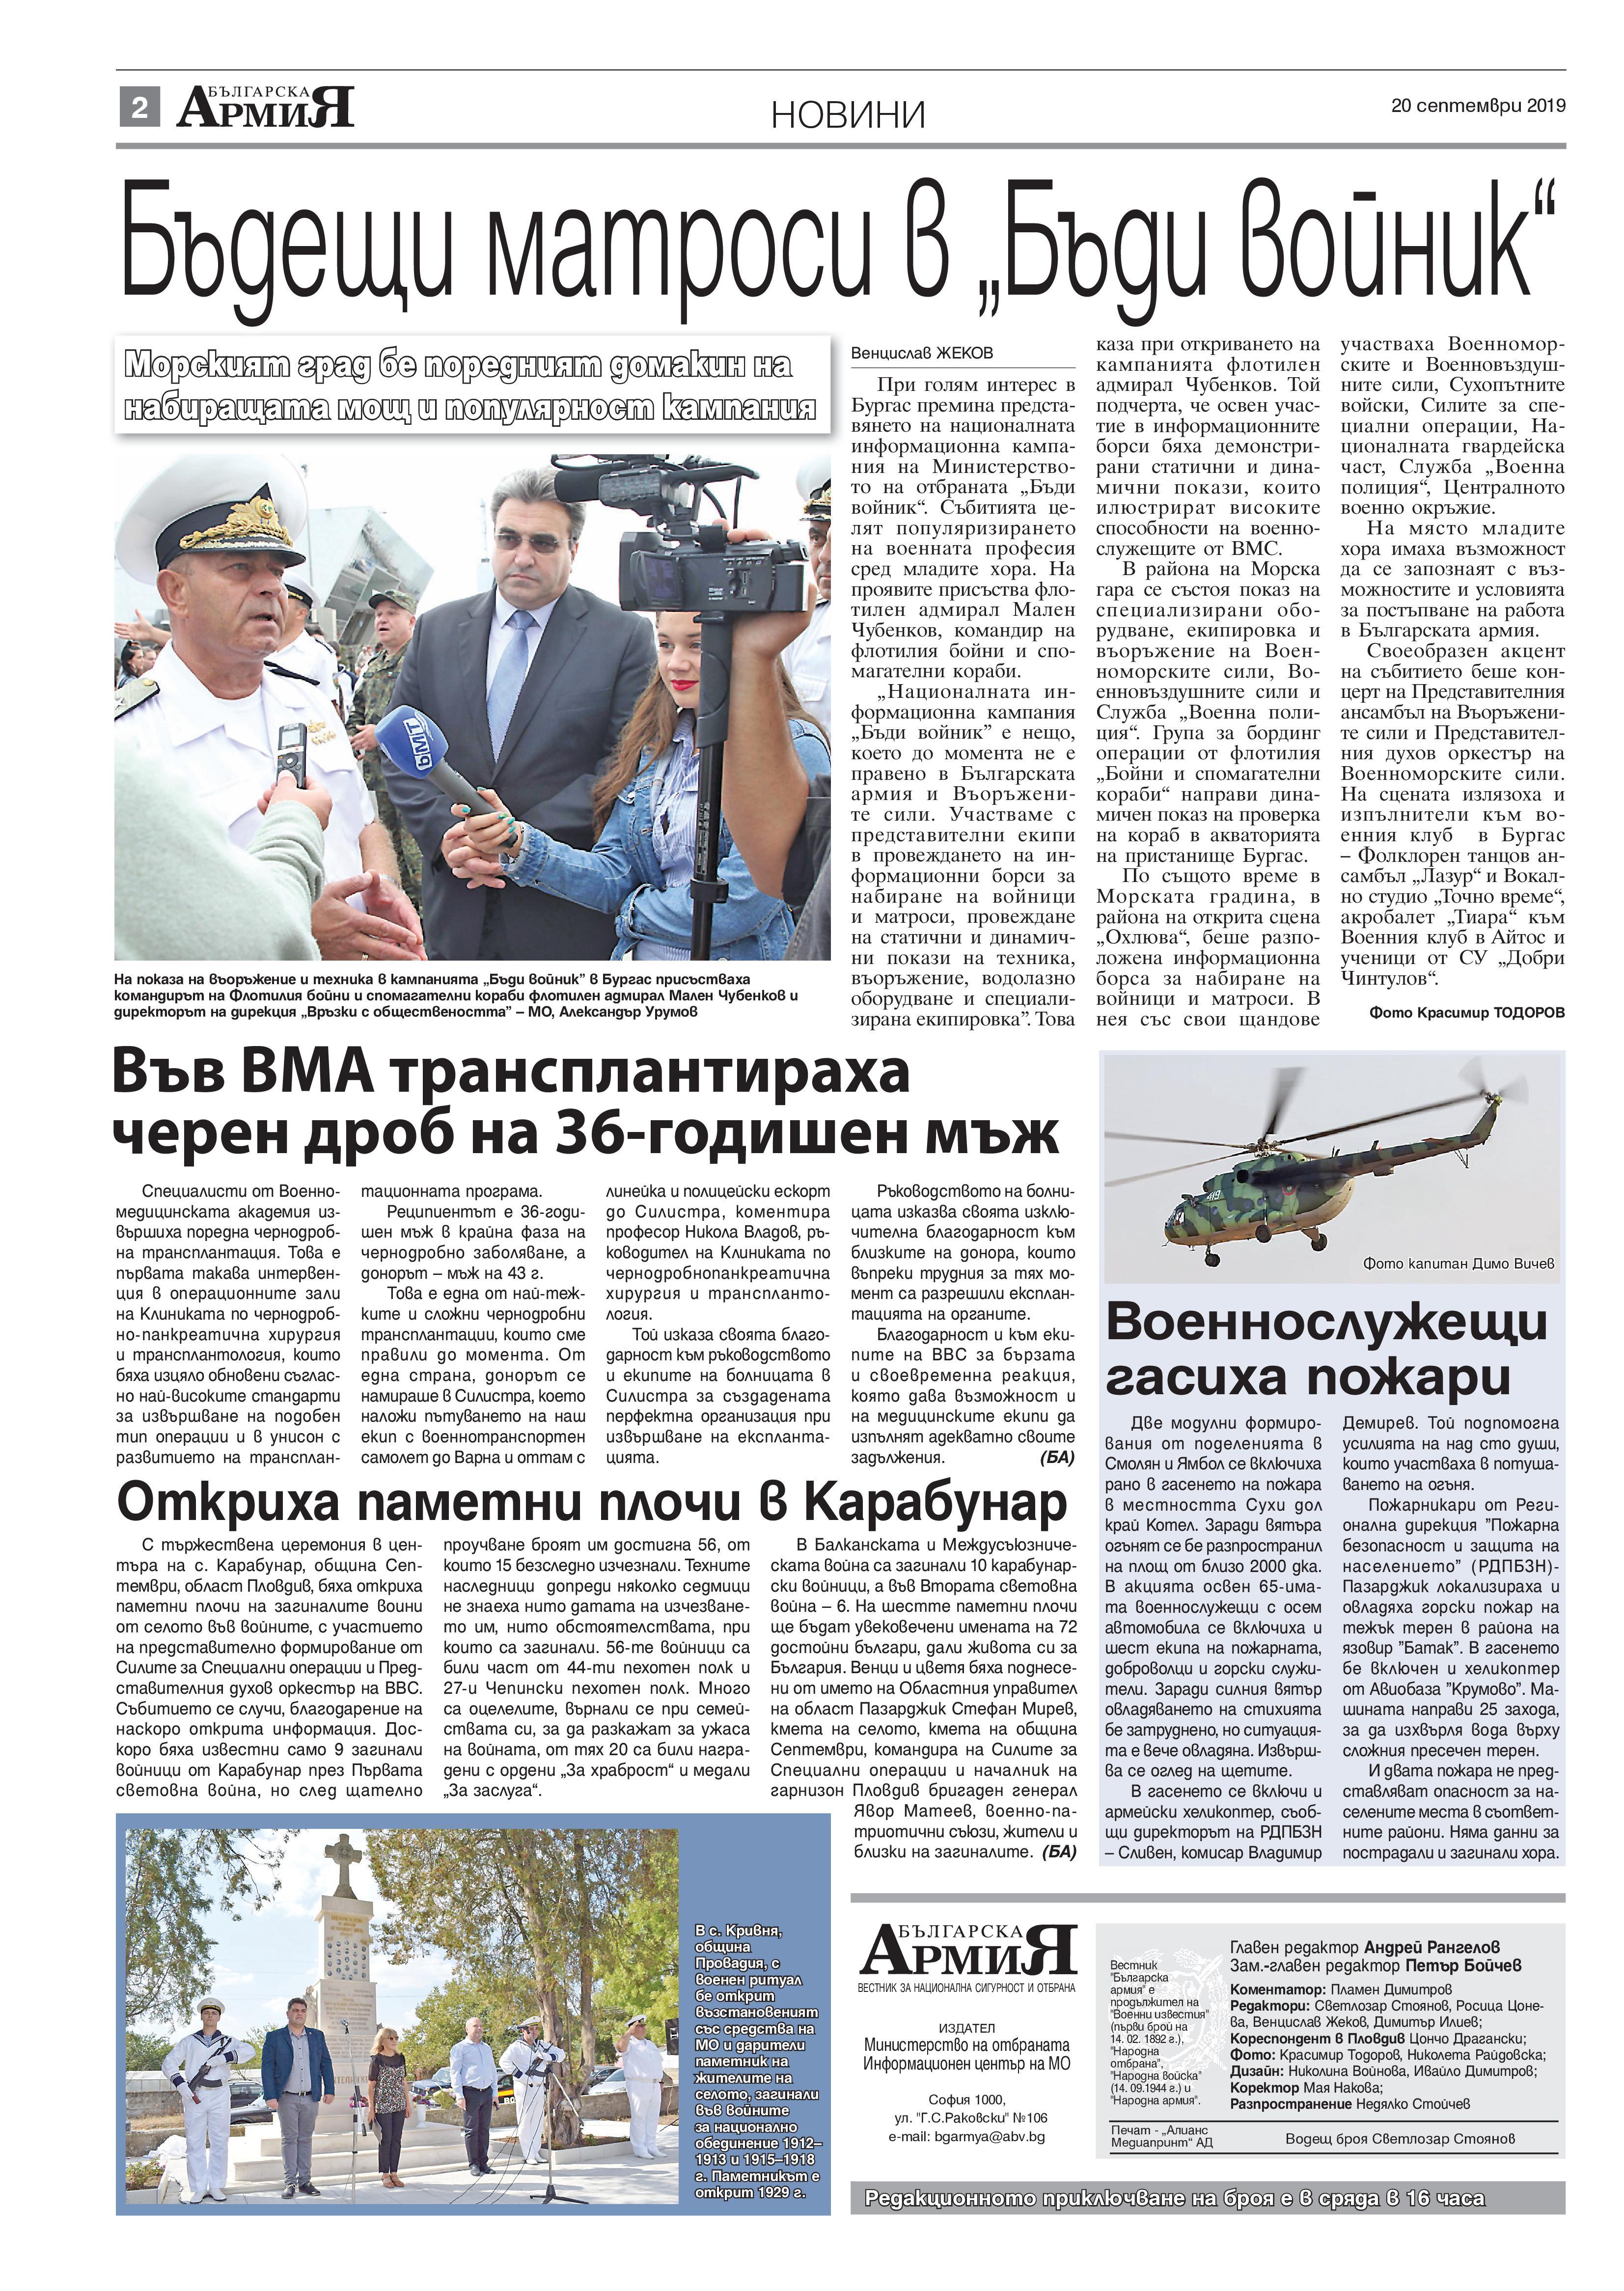 https://armymedia.bg/wp-content/uploads/2015/06/02-31.jpg